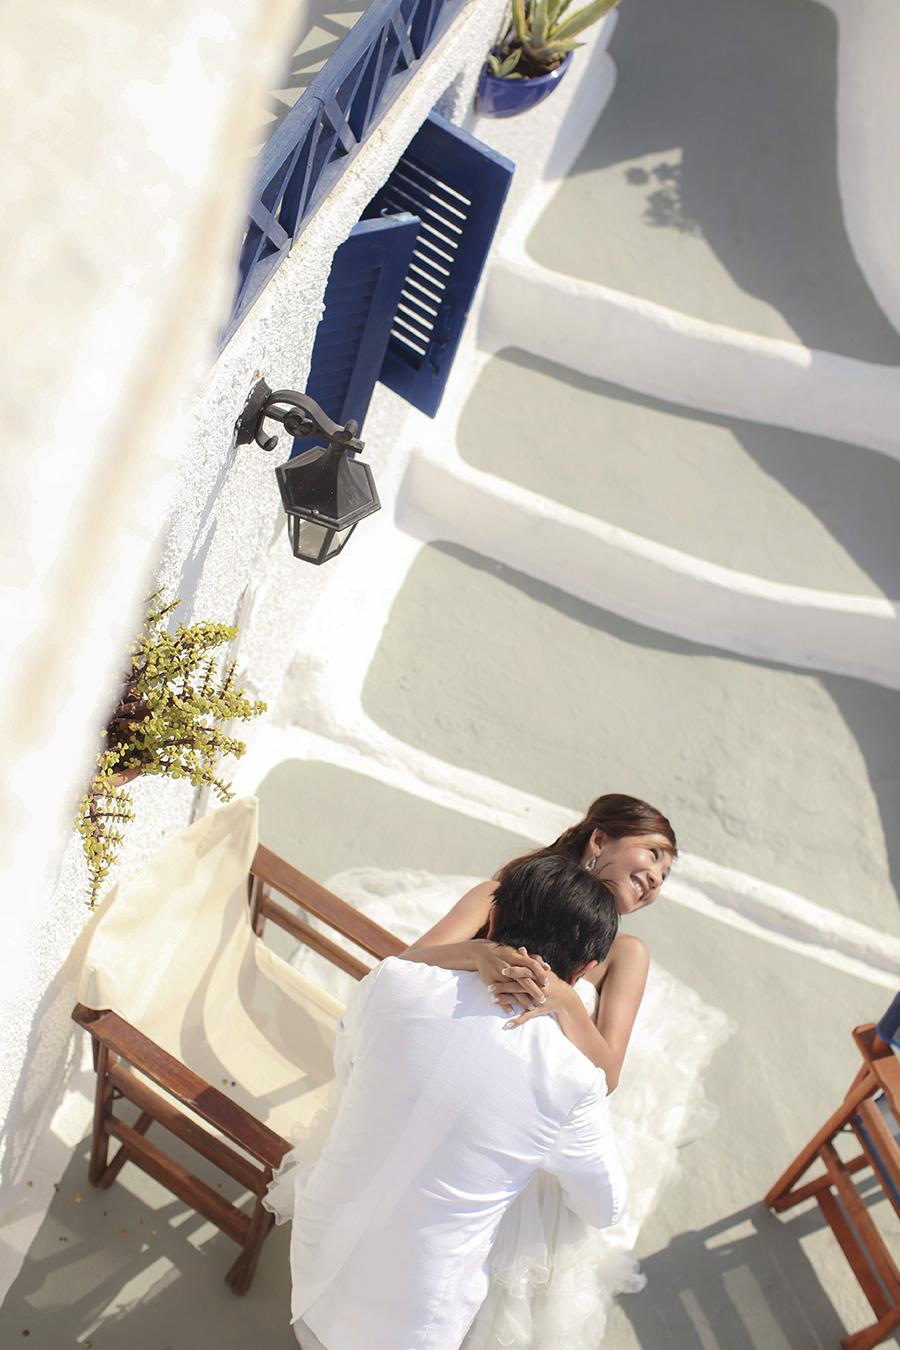 santorini greece . wedding photography by kurt ahs . 3094.jpg